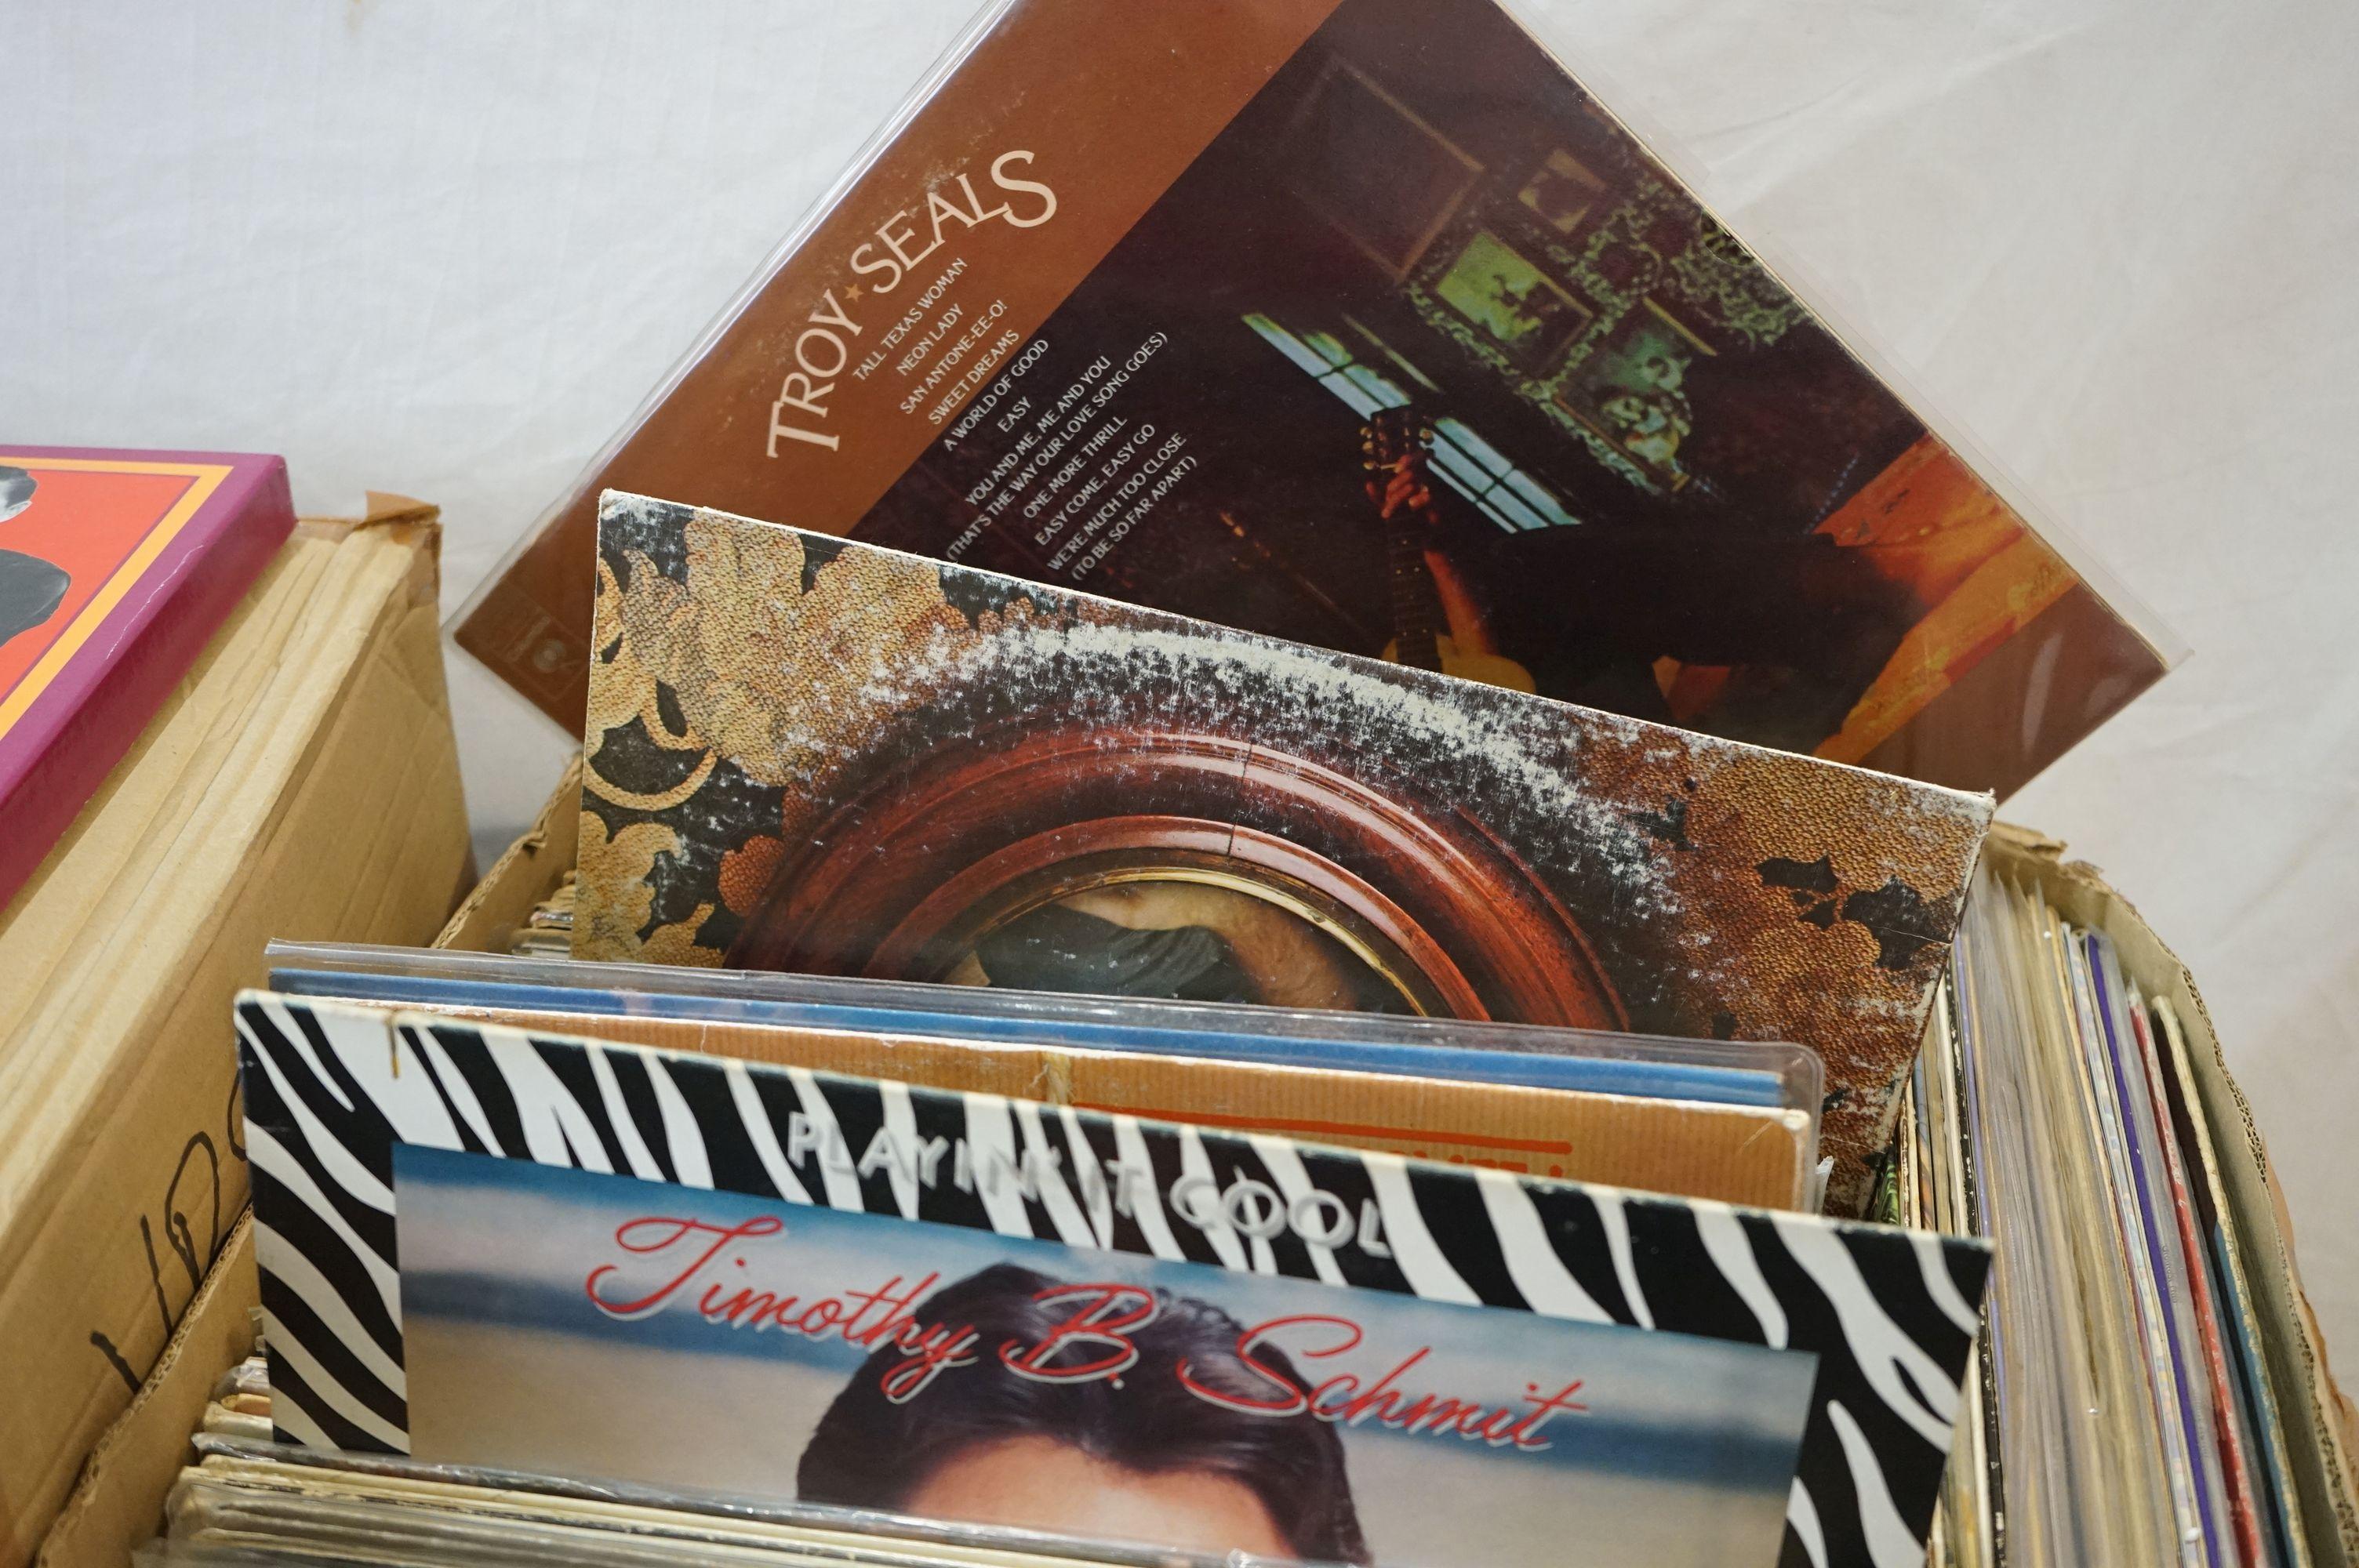 Vinyl - Around 130 LPs and 14 Box Sets to include Charlie Wiseman, Mac Wiseman, Slim Whitman etc ( - Image 2 of 5